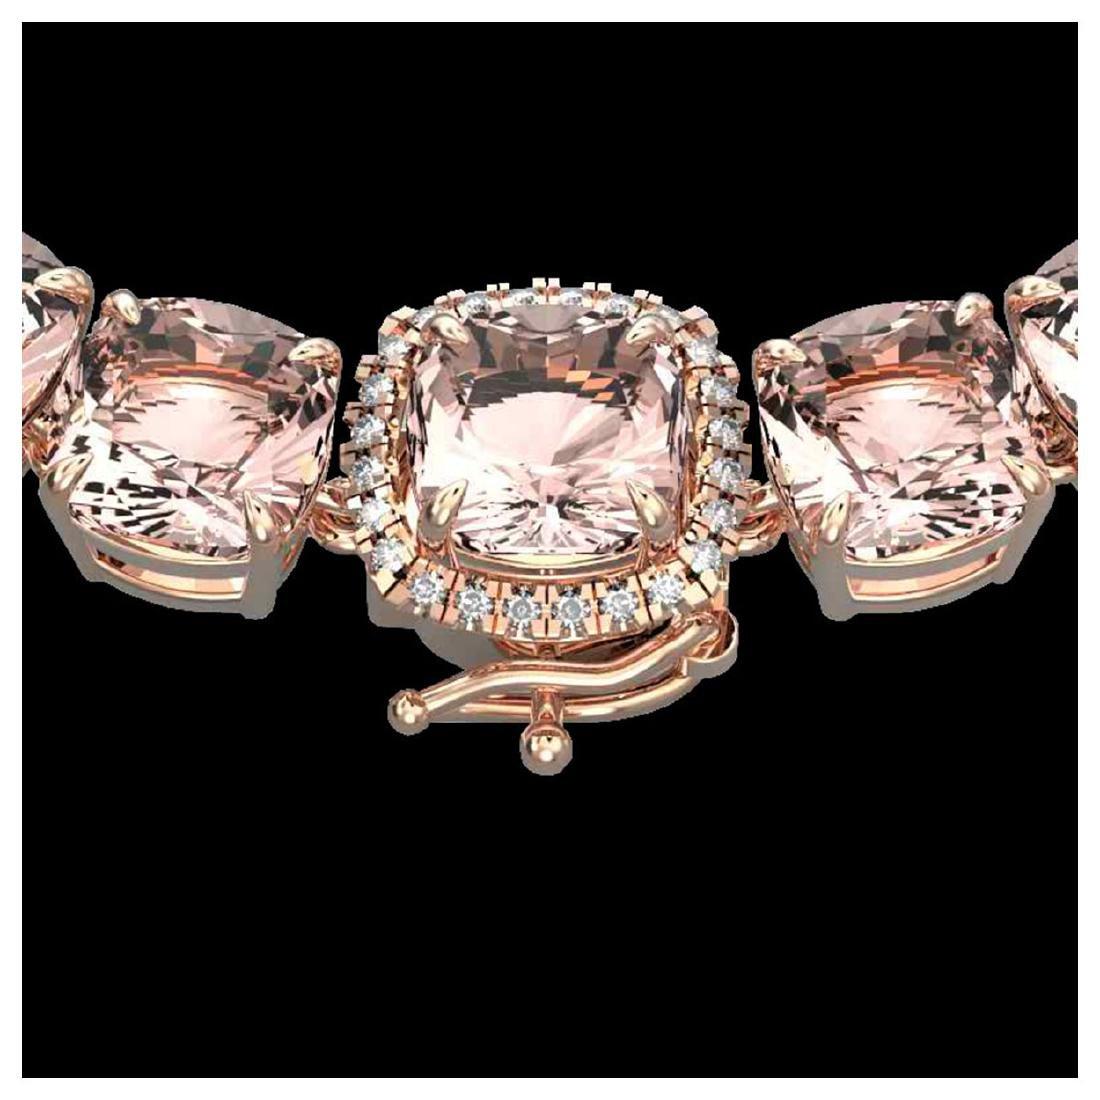 87 ctw Morganite & Diamond Necklace 14K Rose Gold -